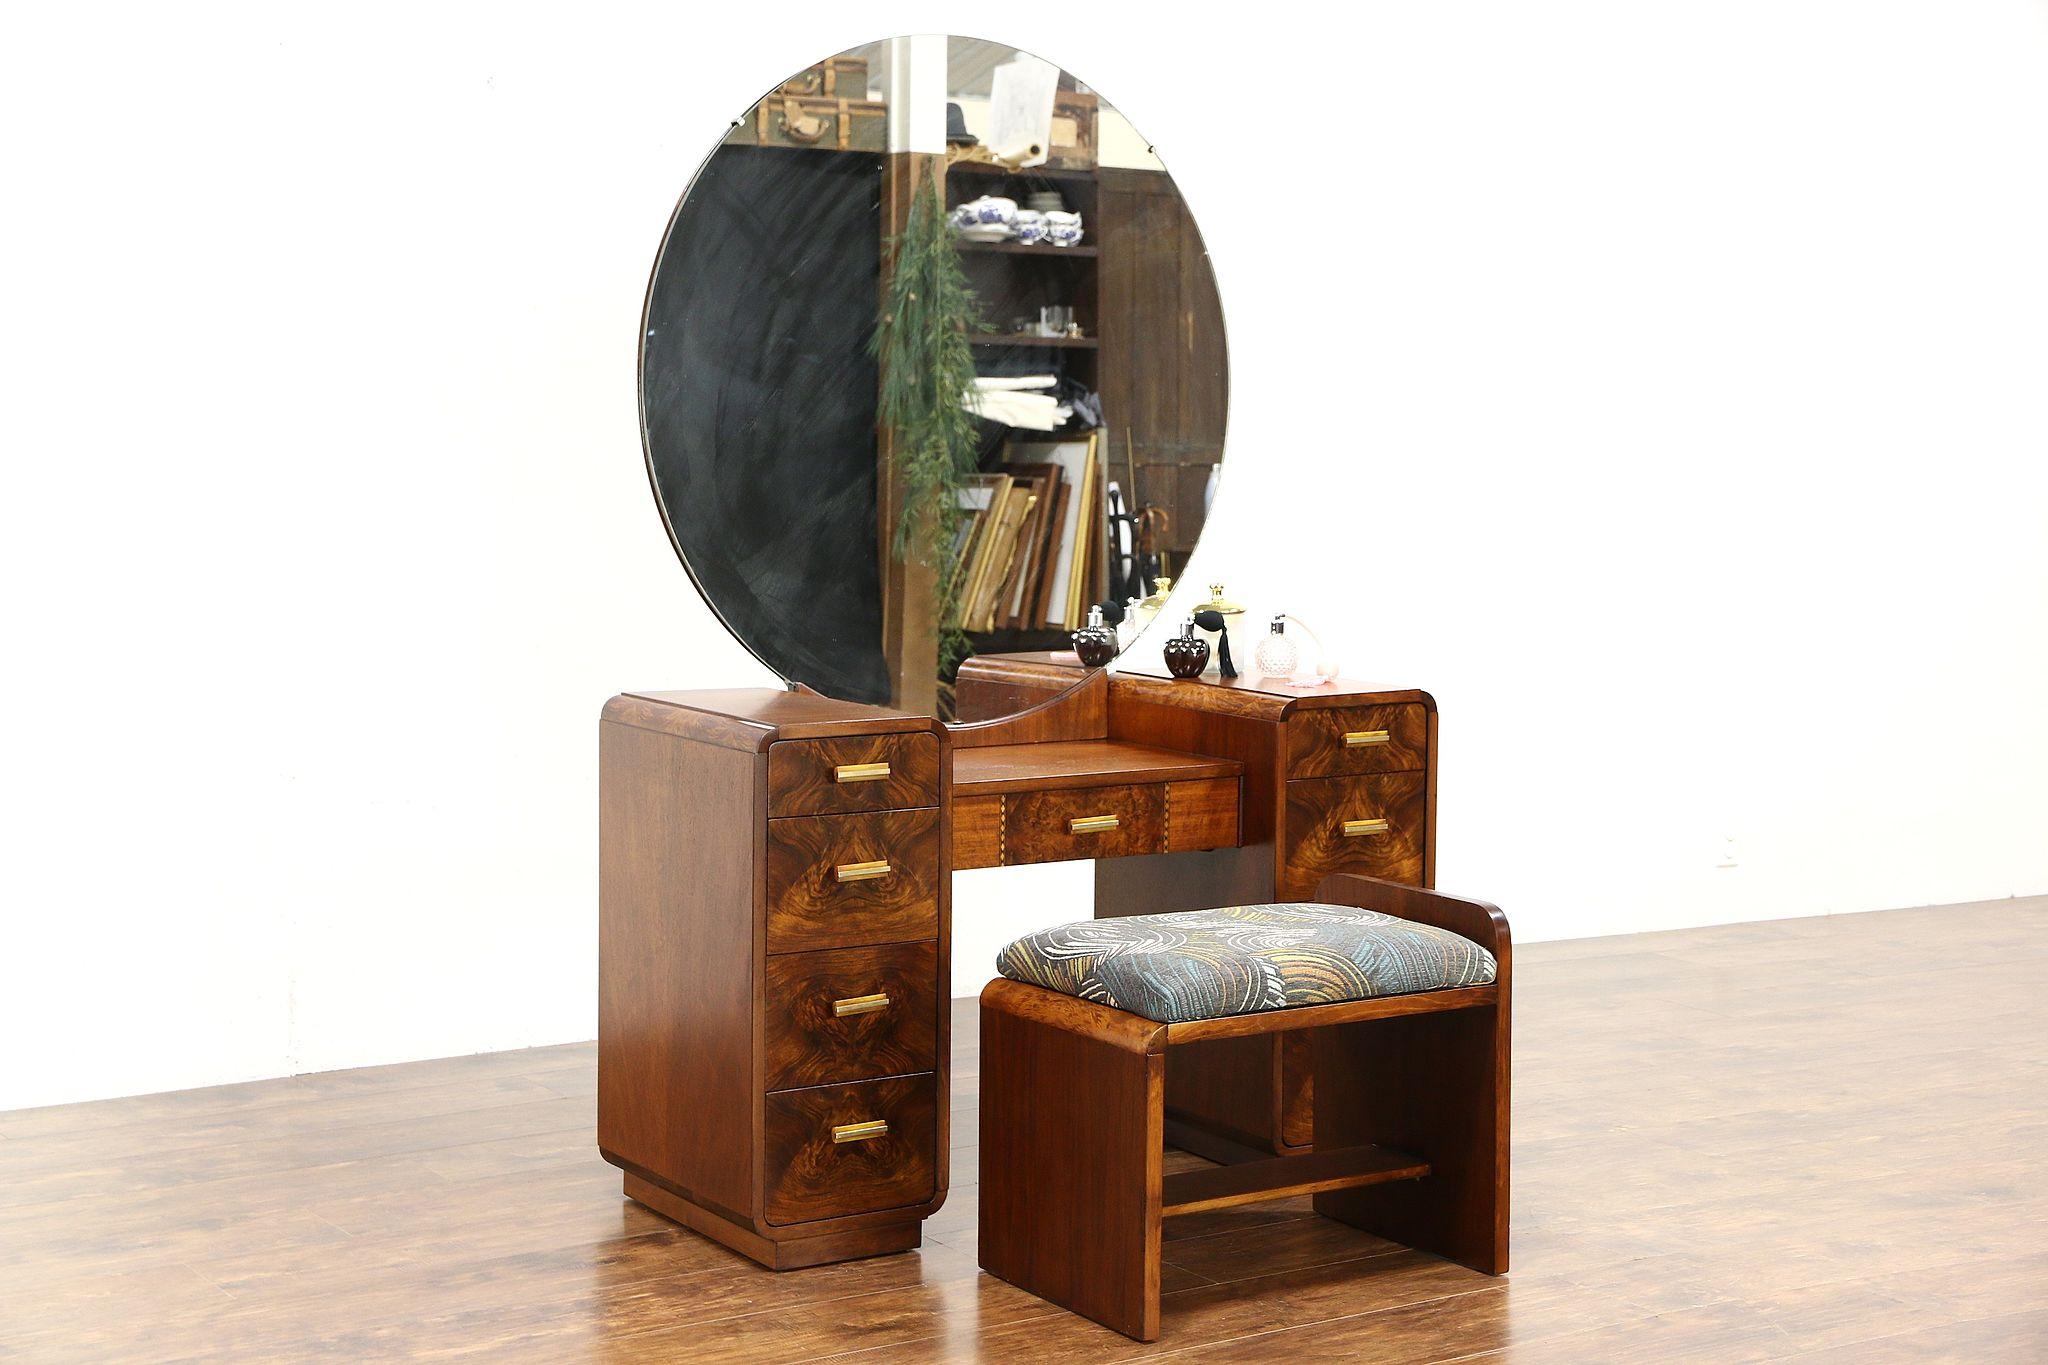 Wondrous Art Deco 1940 Vintage Dressing Table Or Vanity Mirror Bench Ibusinesslaw Wood Chair Design Ideas Ibusinesslaworg